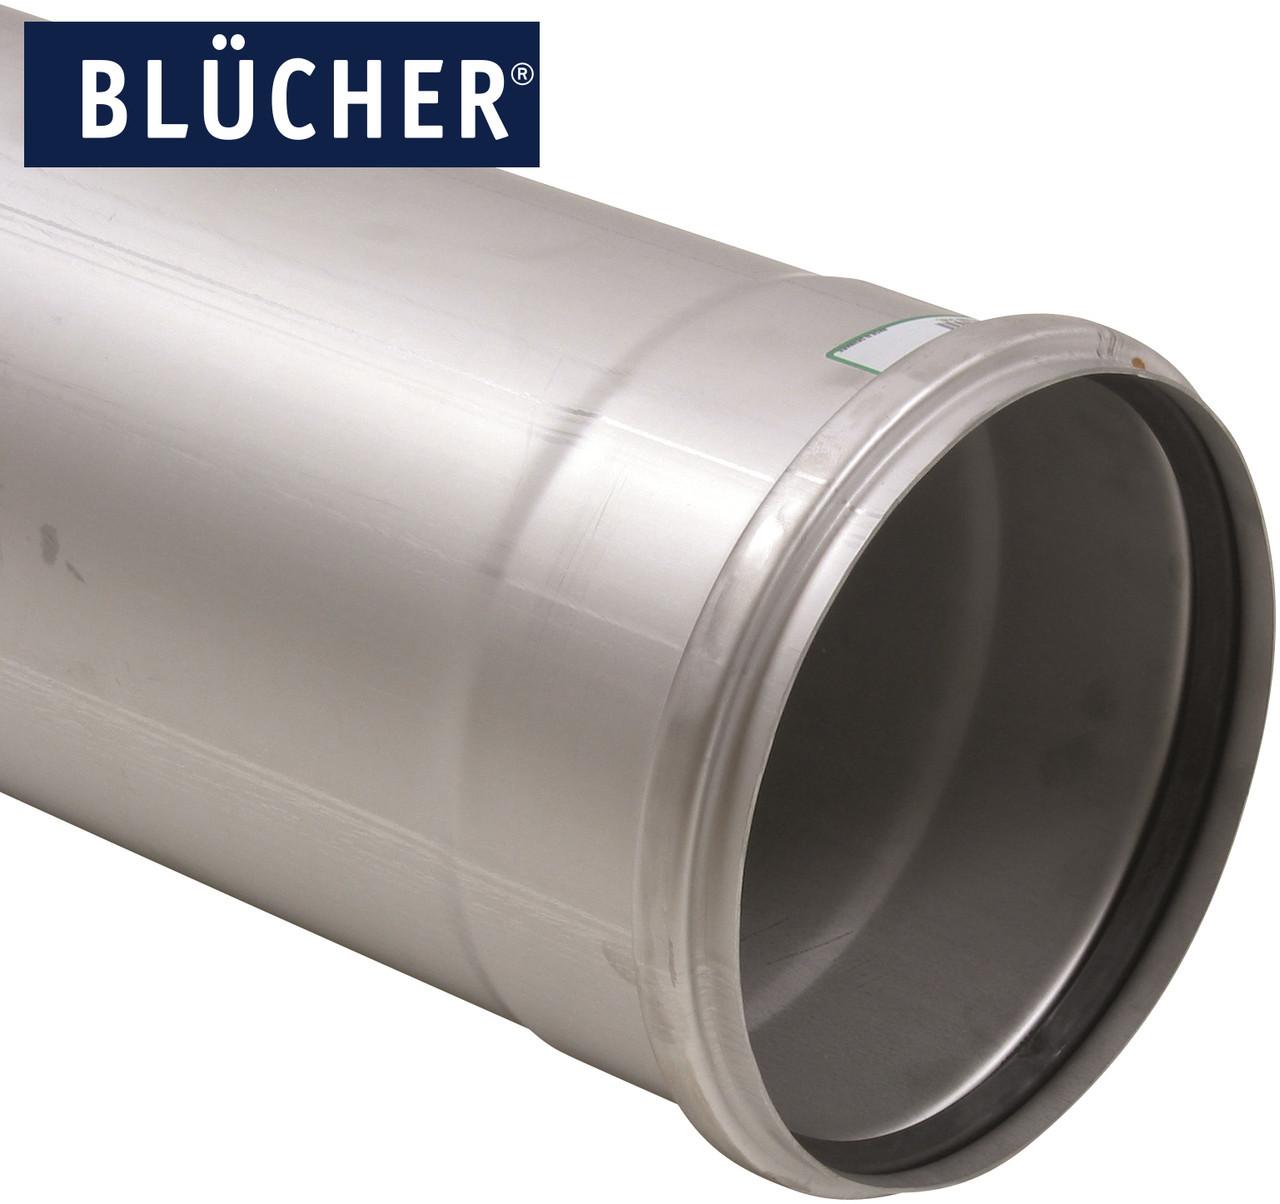 Каналізаційна труба BLUCHER з нержавіючої сталі AISI304 / AISI316L, 2000мм, DN200